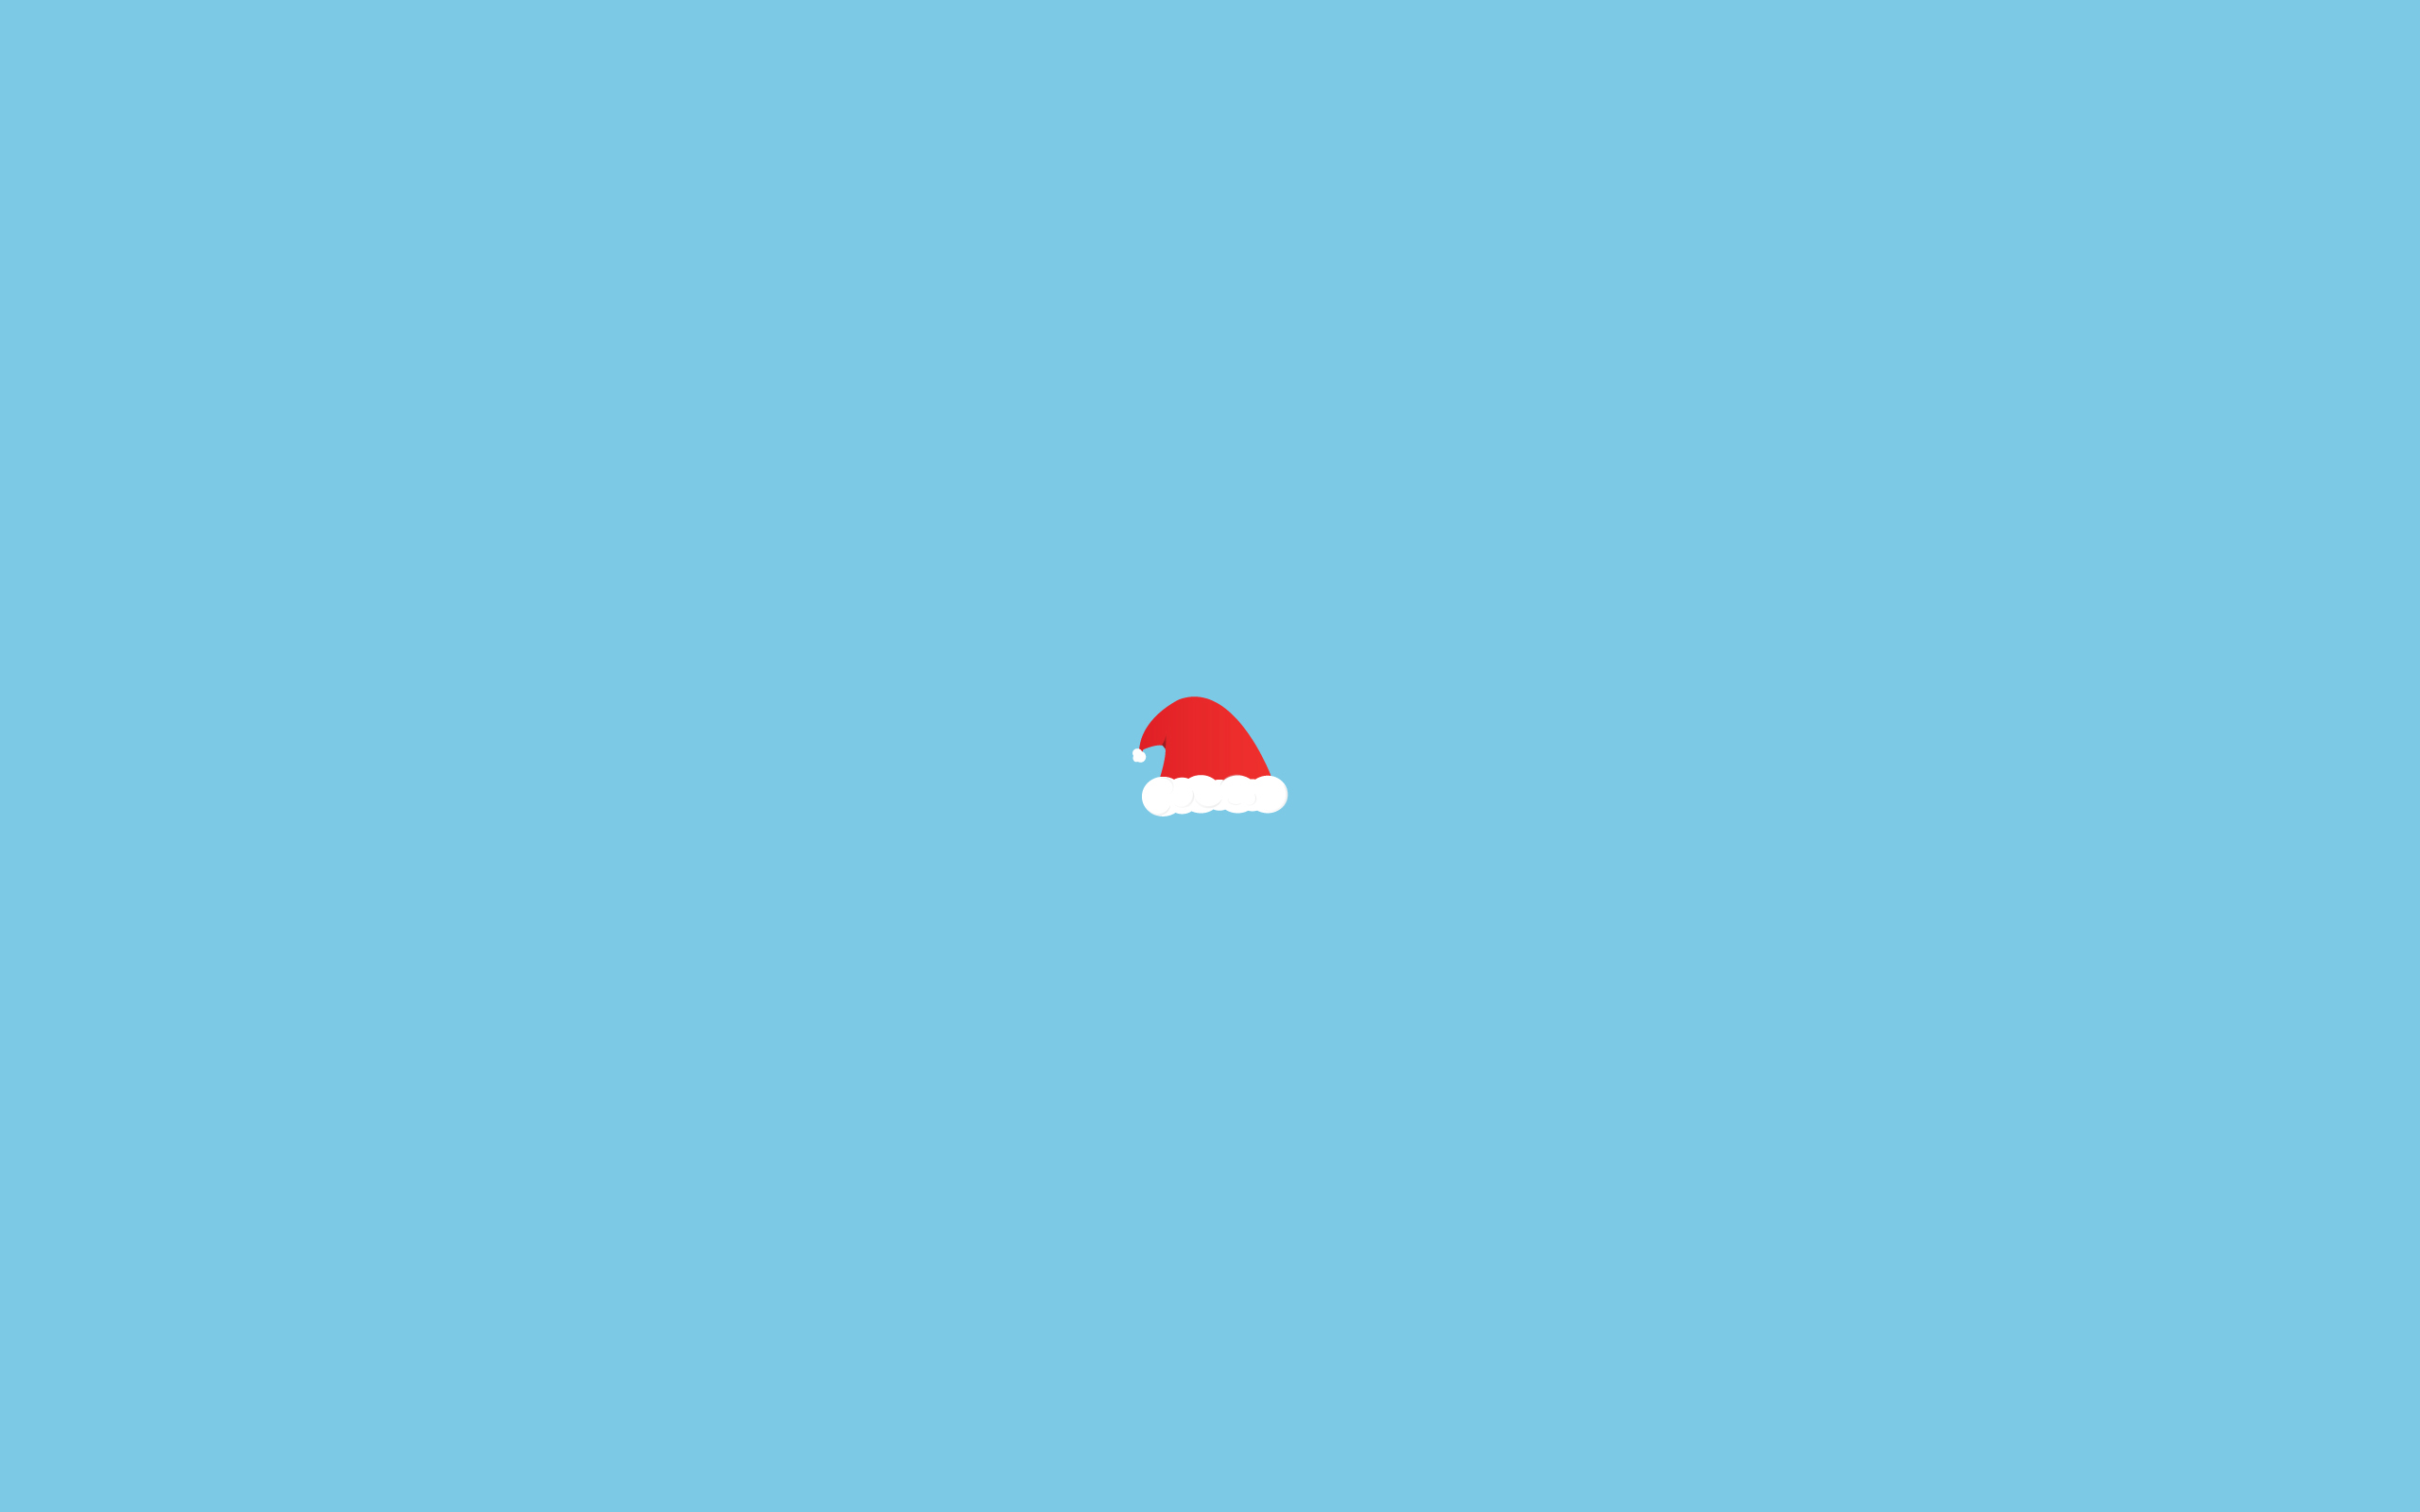 Minimalistic Christmas 2560x1600 Wallpaper 1640133